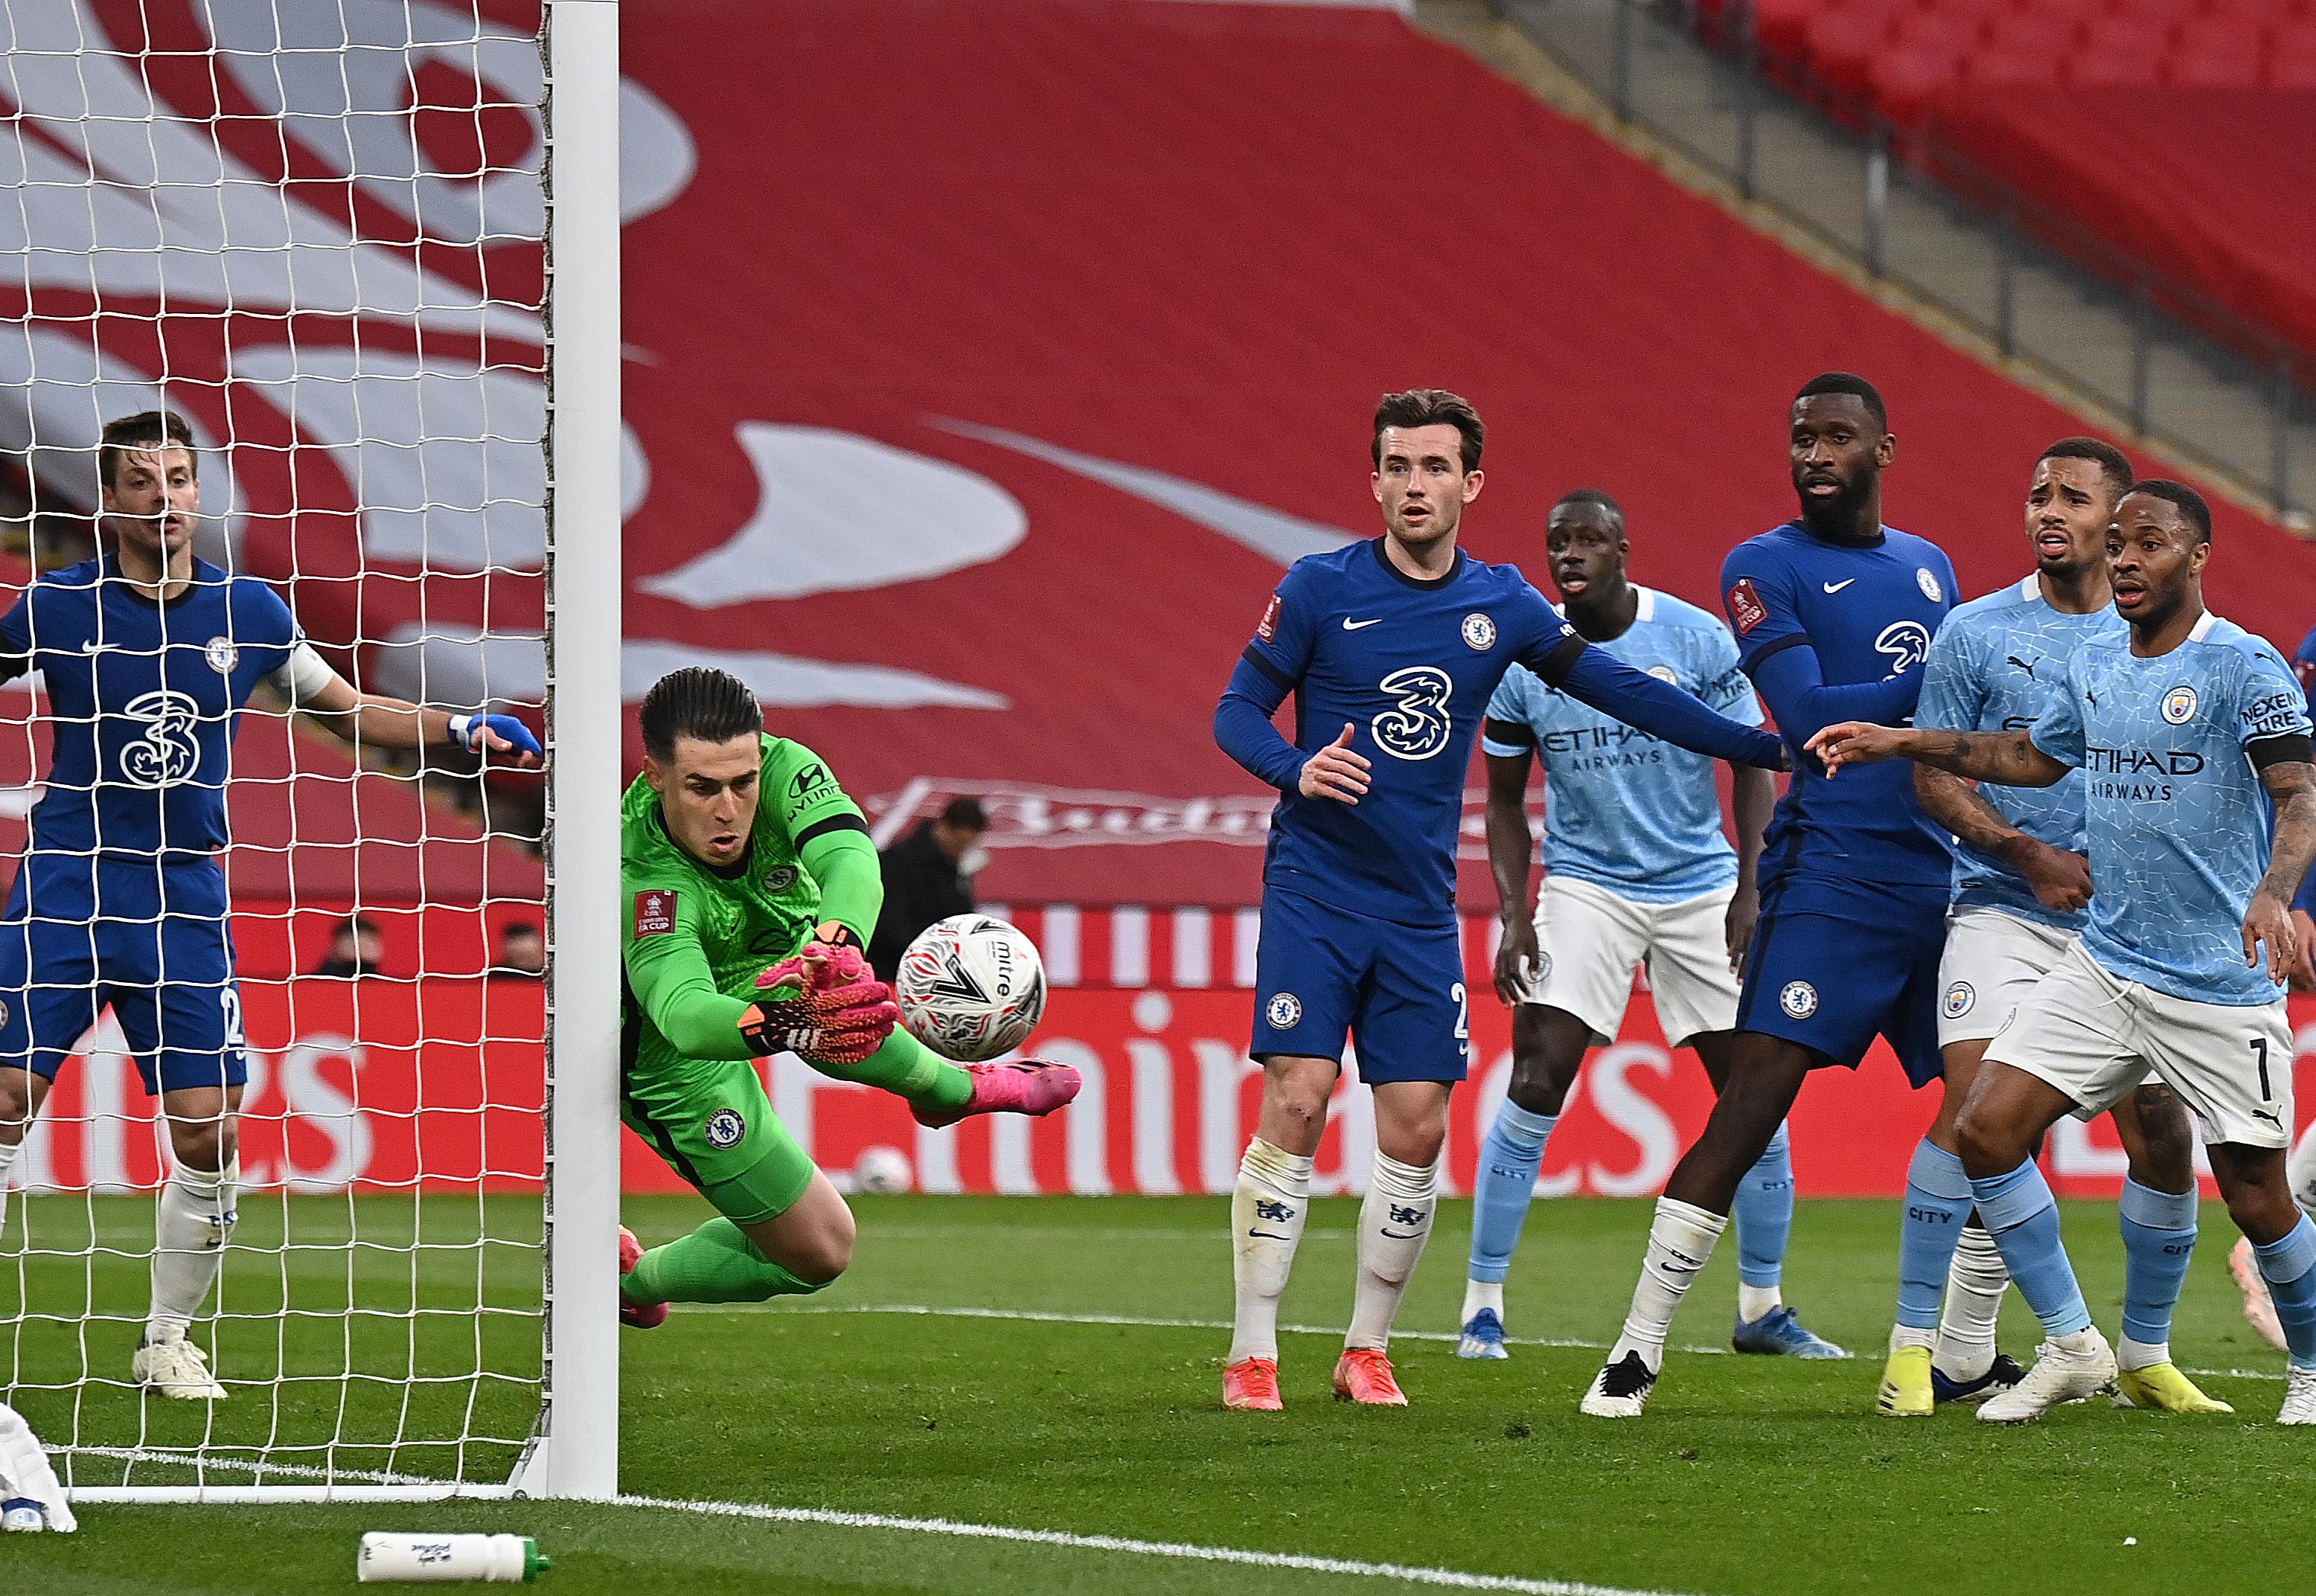 Após saída de clubes ingleses, Superliga Europeia é suspensa